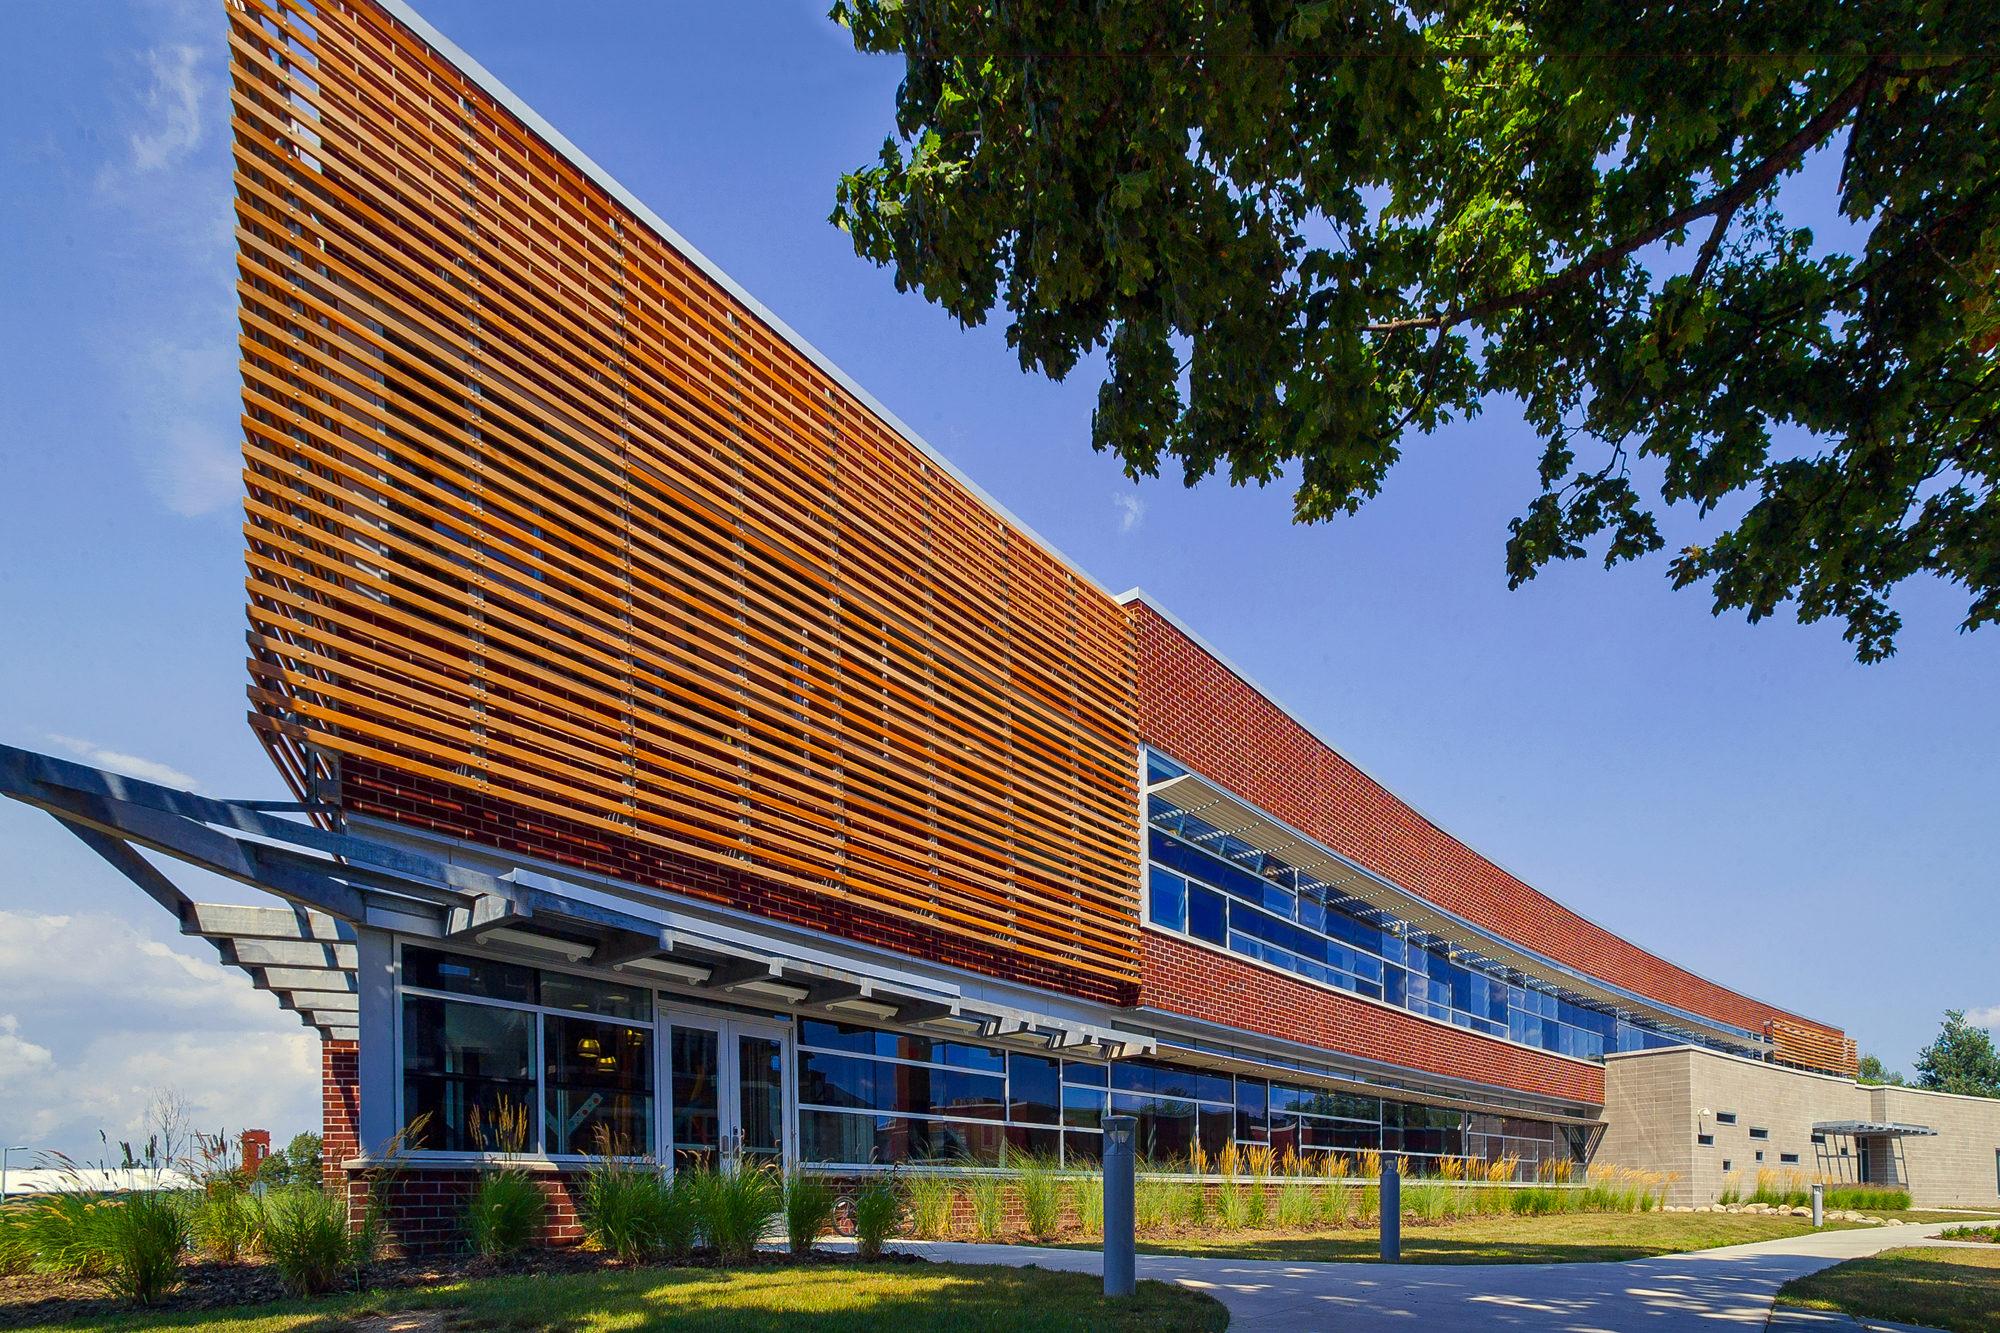 Nichols - Architectural Resources